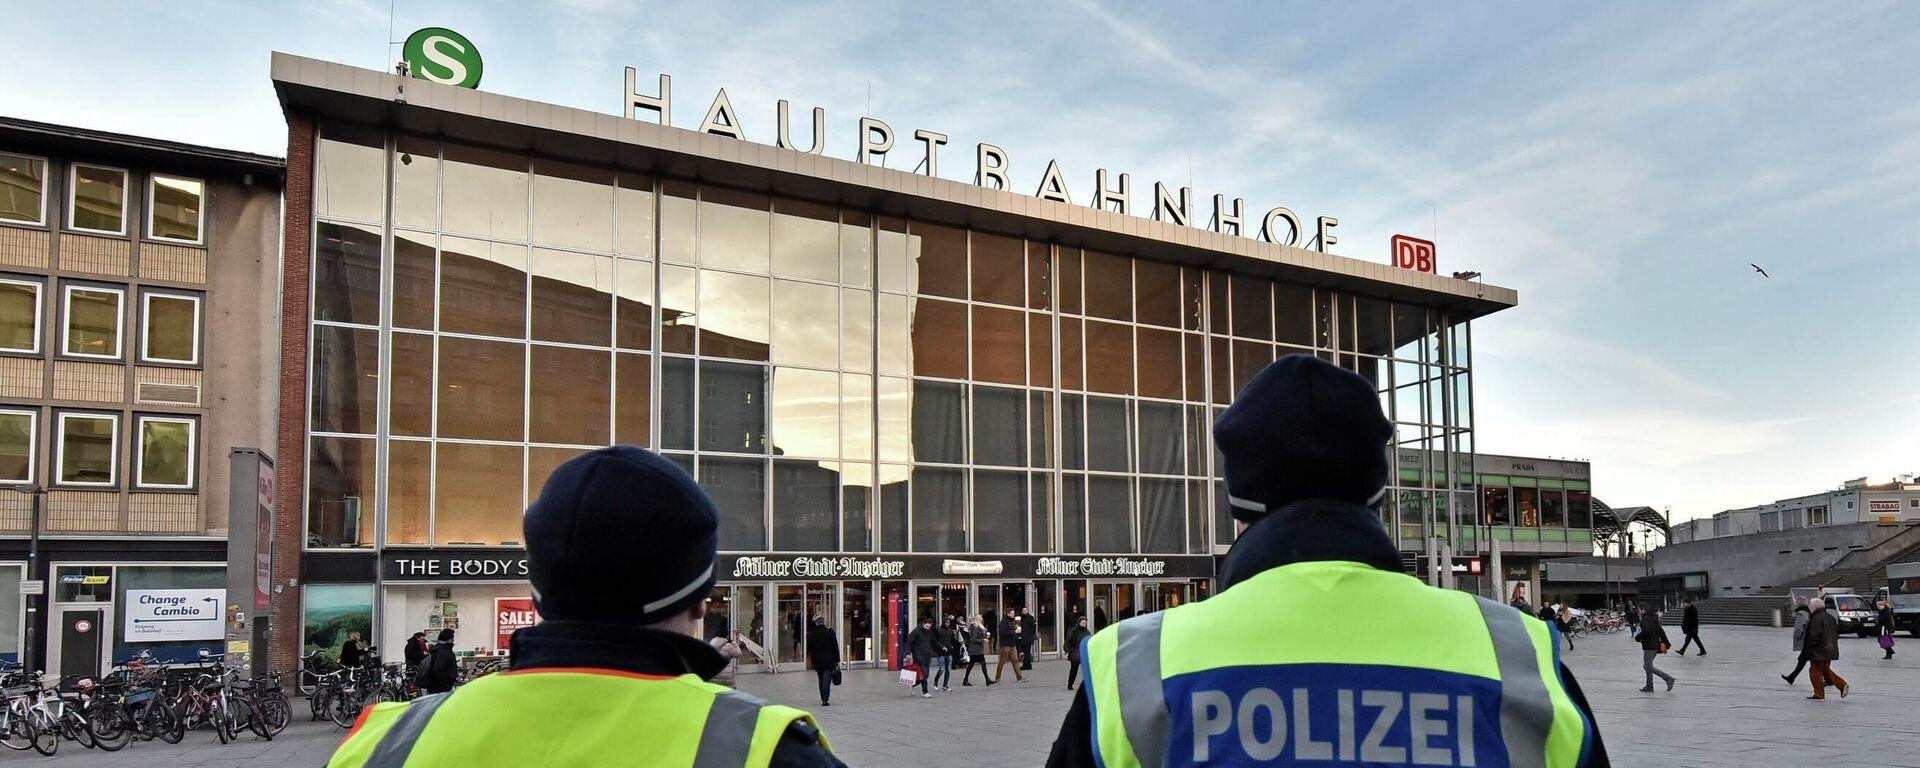 Der Kölner Hauptbahnhof (Archivfoto) - SNA, 1920, 10.02.2021